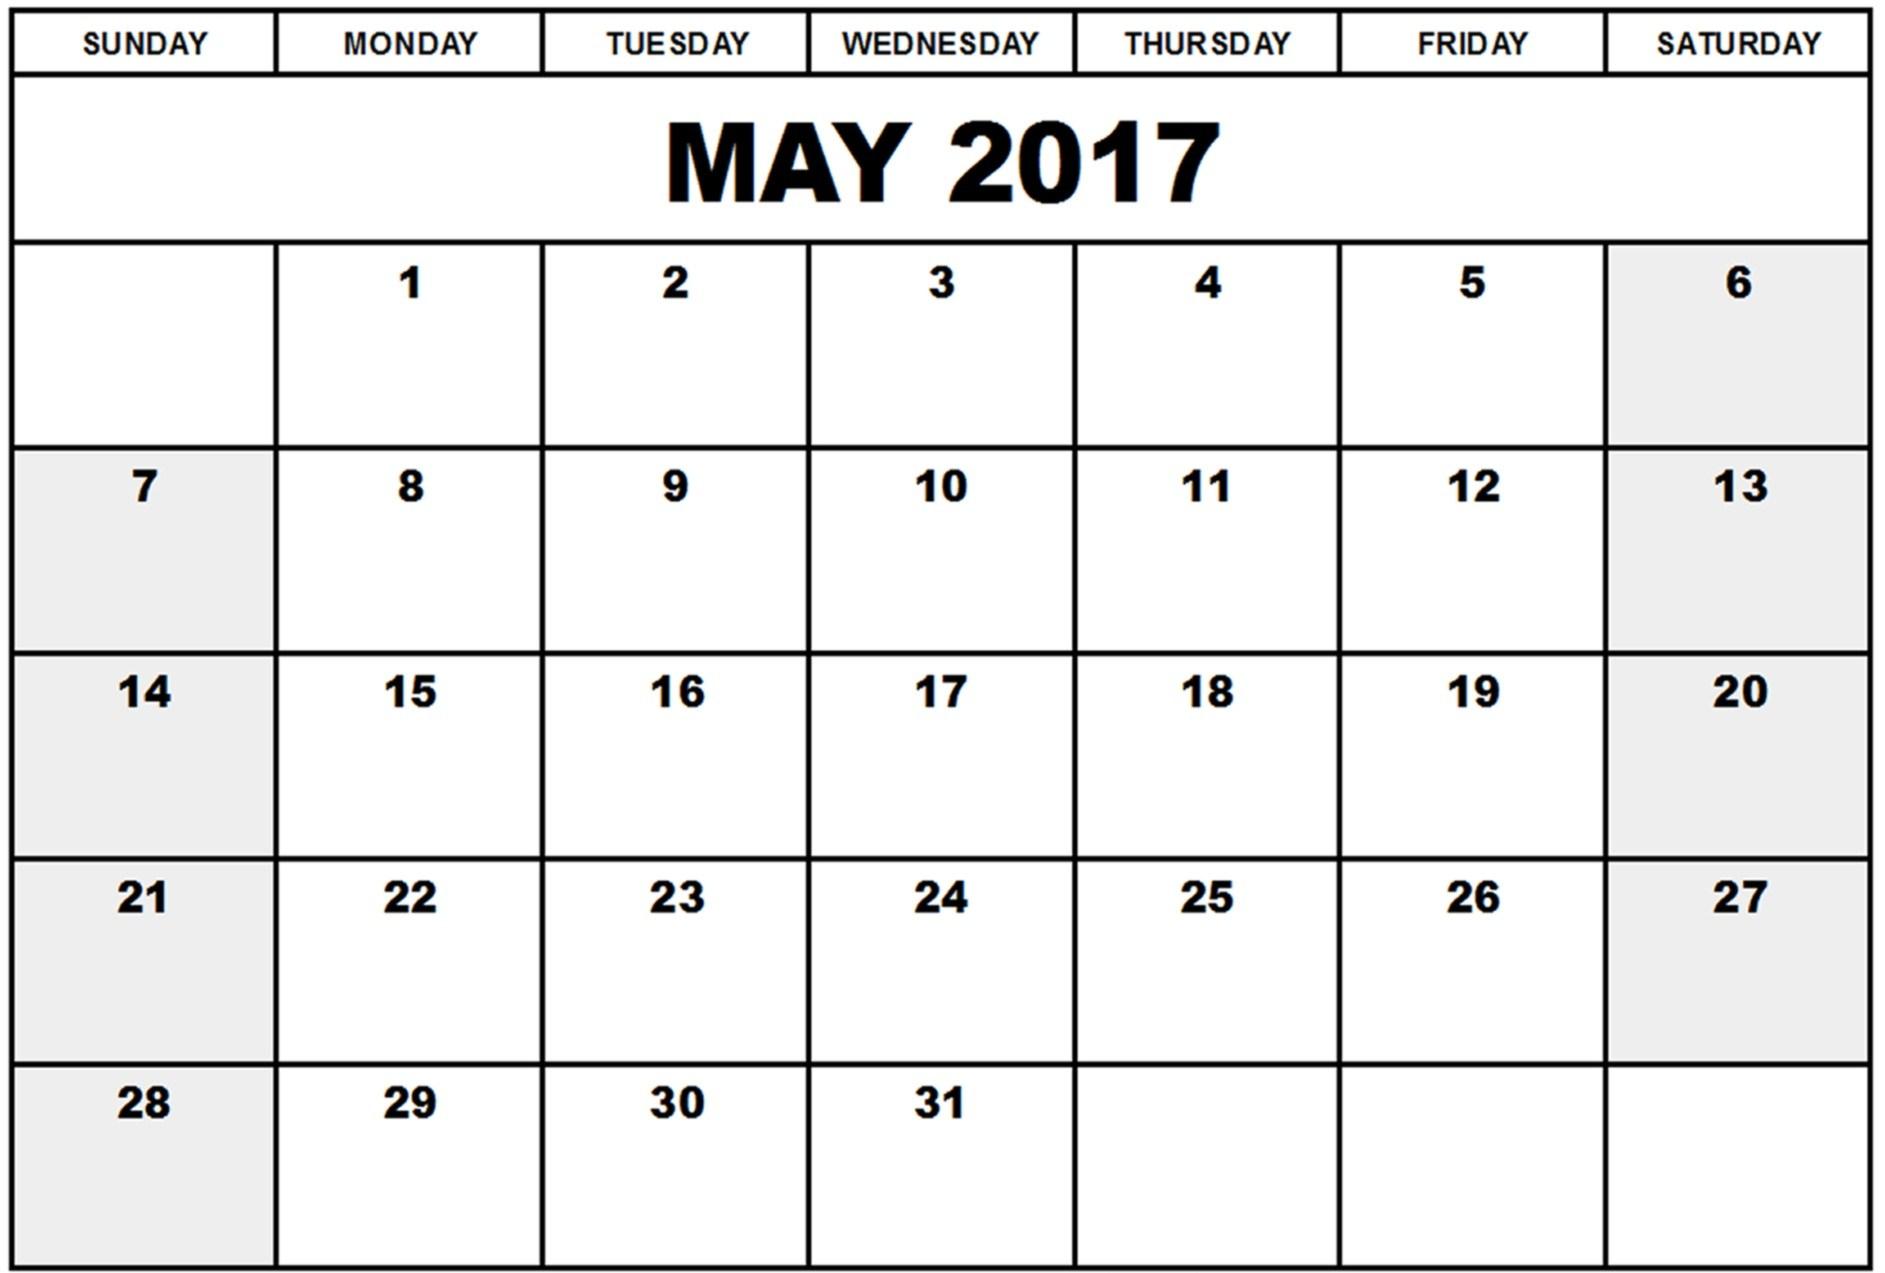 Calendar clipart may 2017.